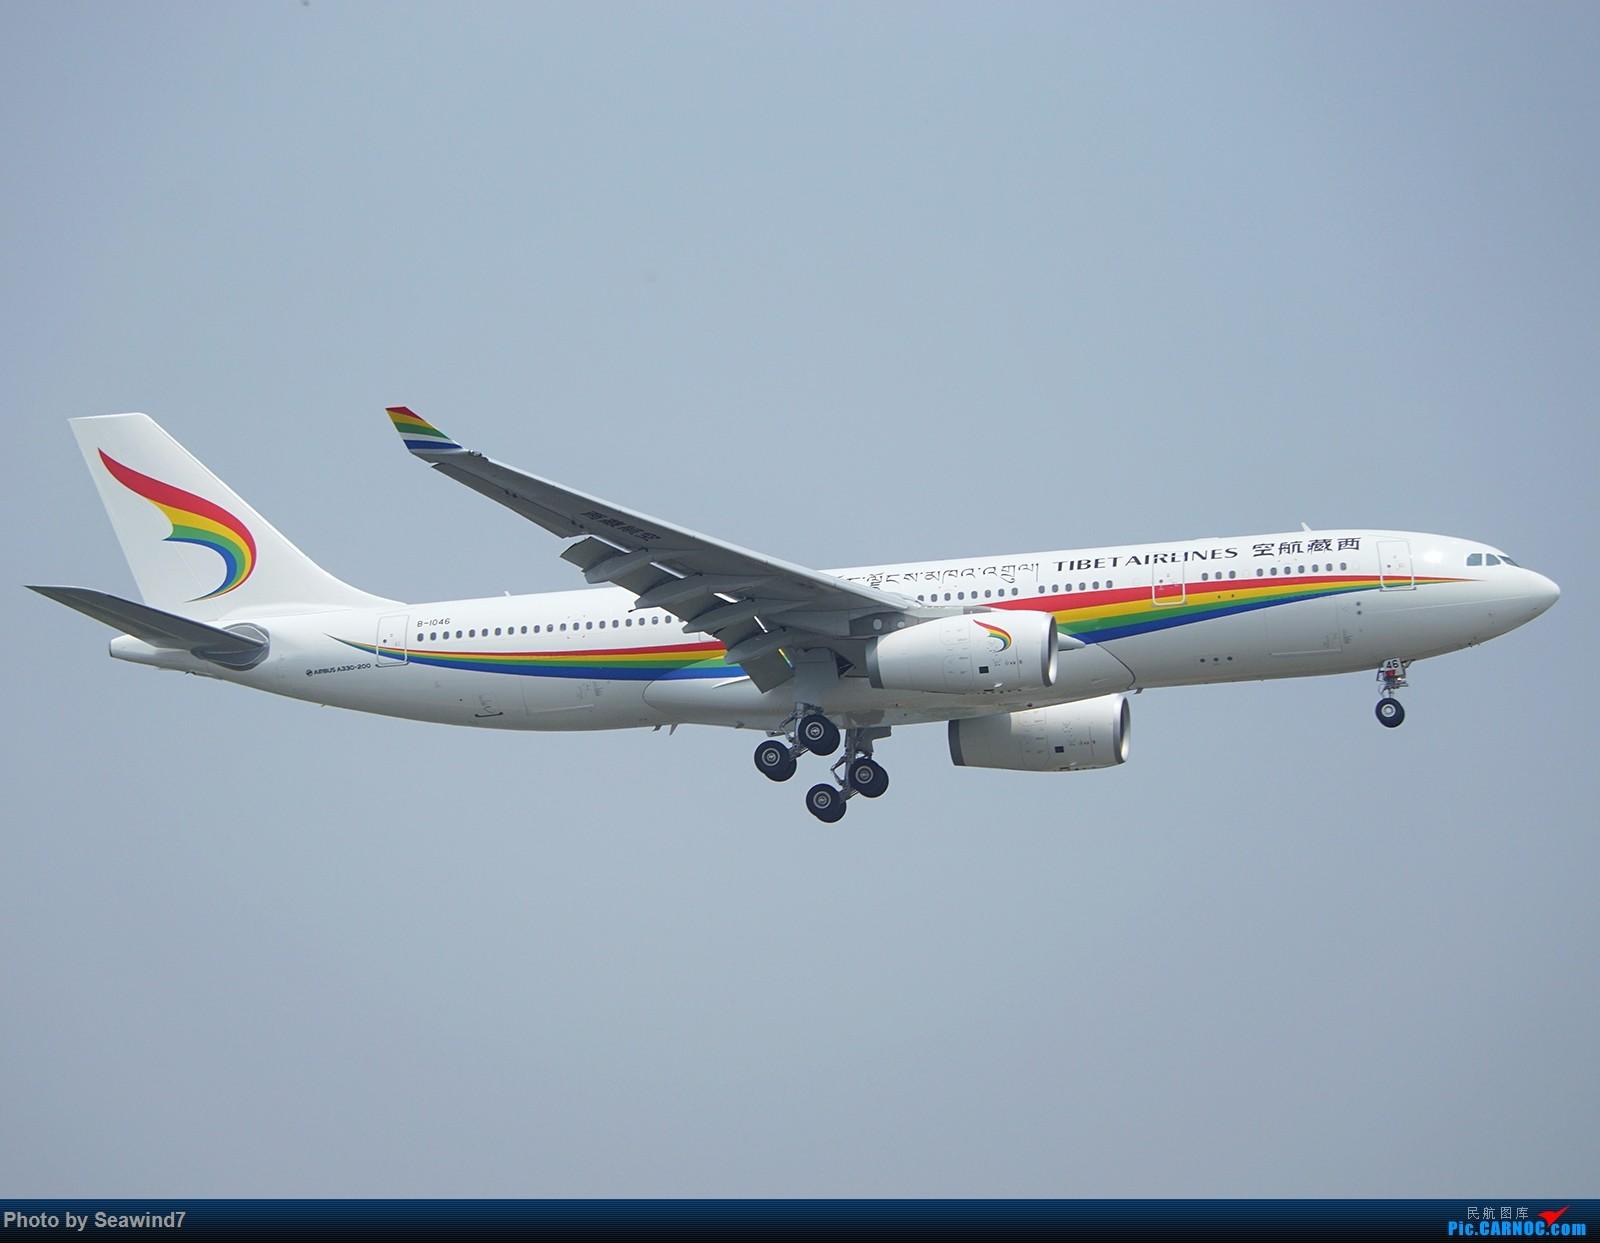 Re:[原创]新手的五一假期(含玩具总动员) AIRBUS A330-200 B-1046 中国上海虹桥国际机场